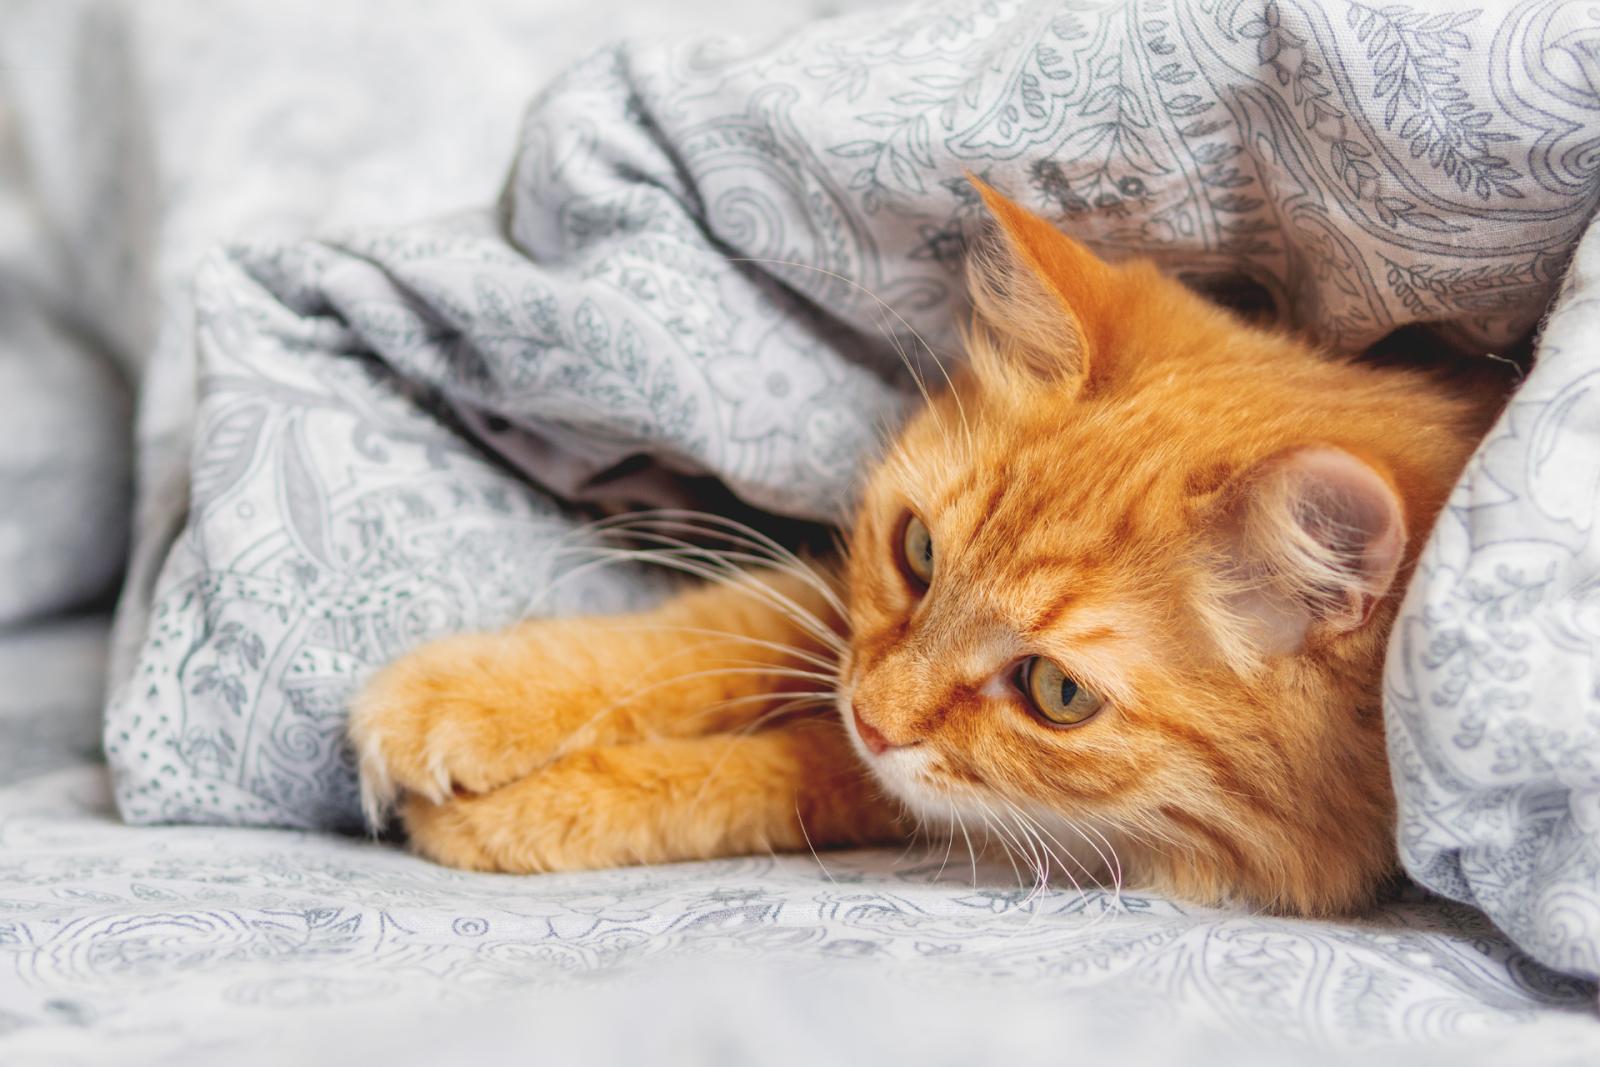 ginger cat in a blanket